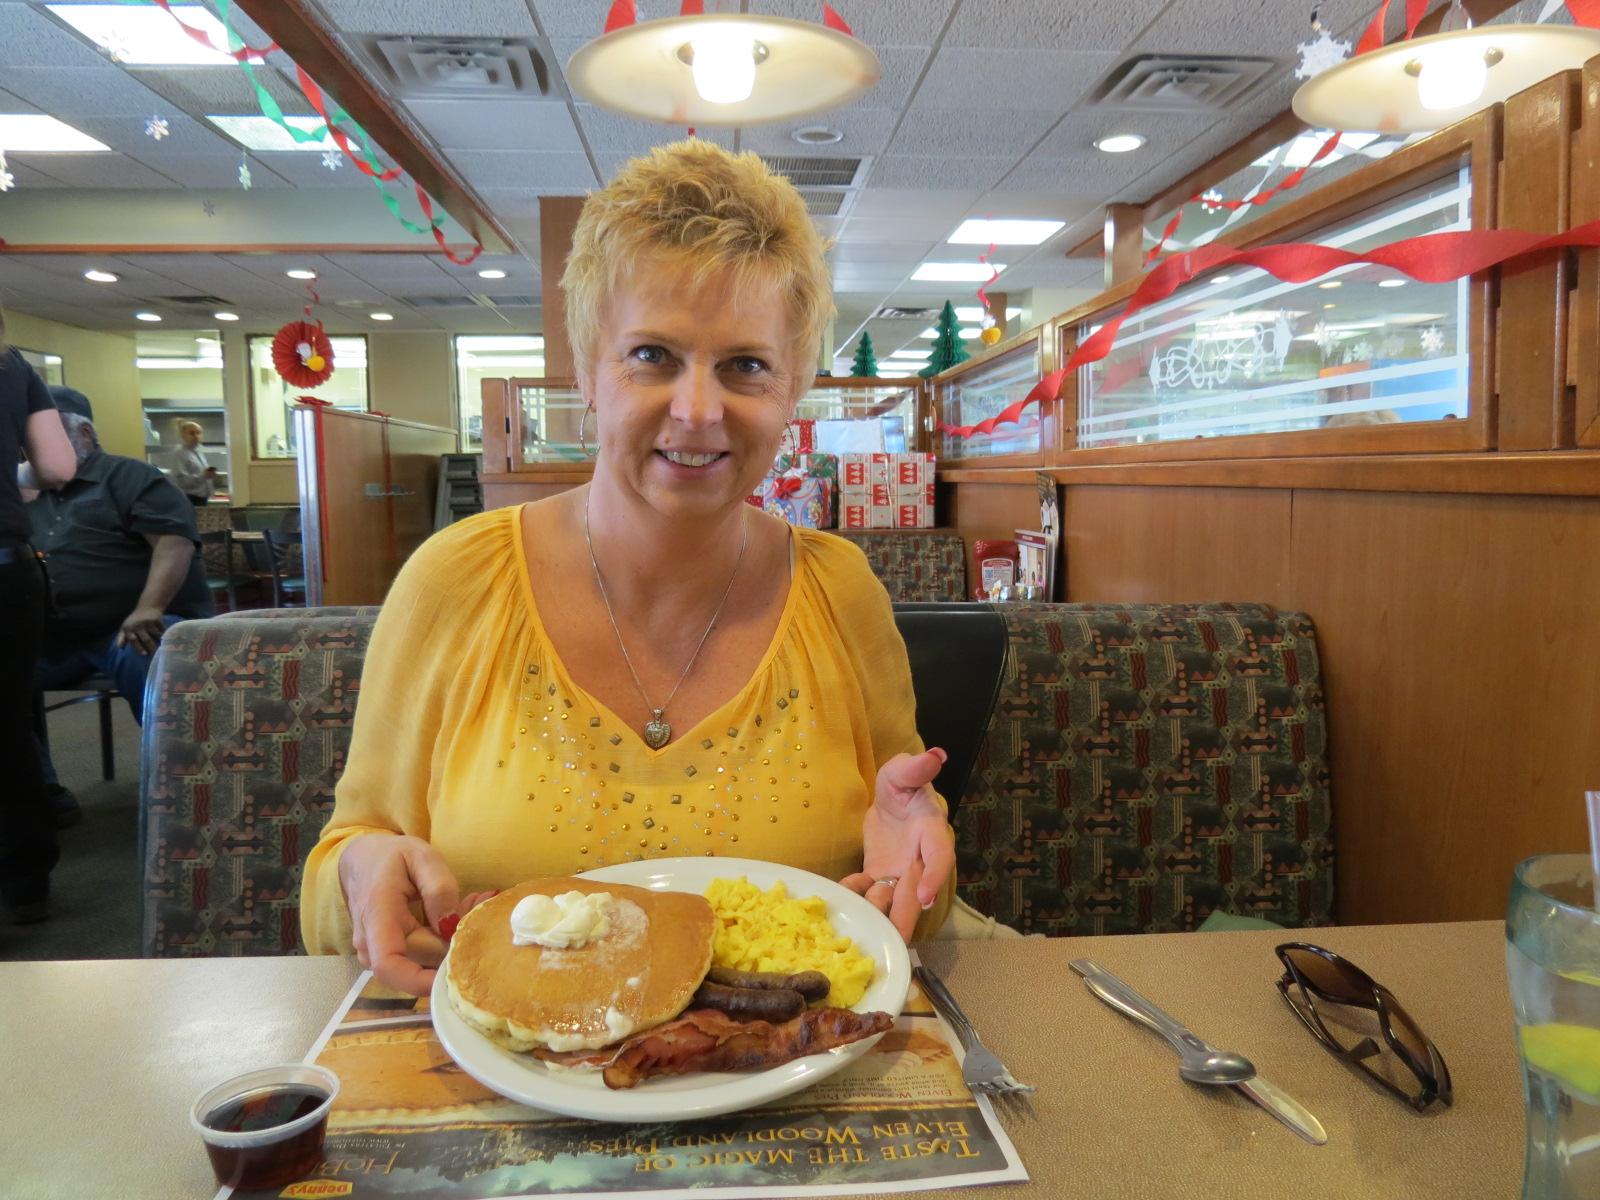 Free Grand Slam Breakfast at Denny's for my birthday!